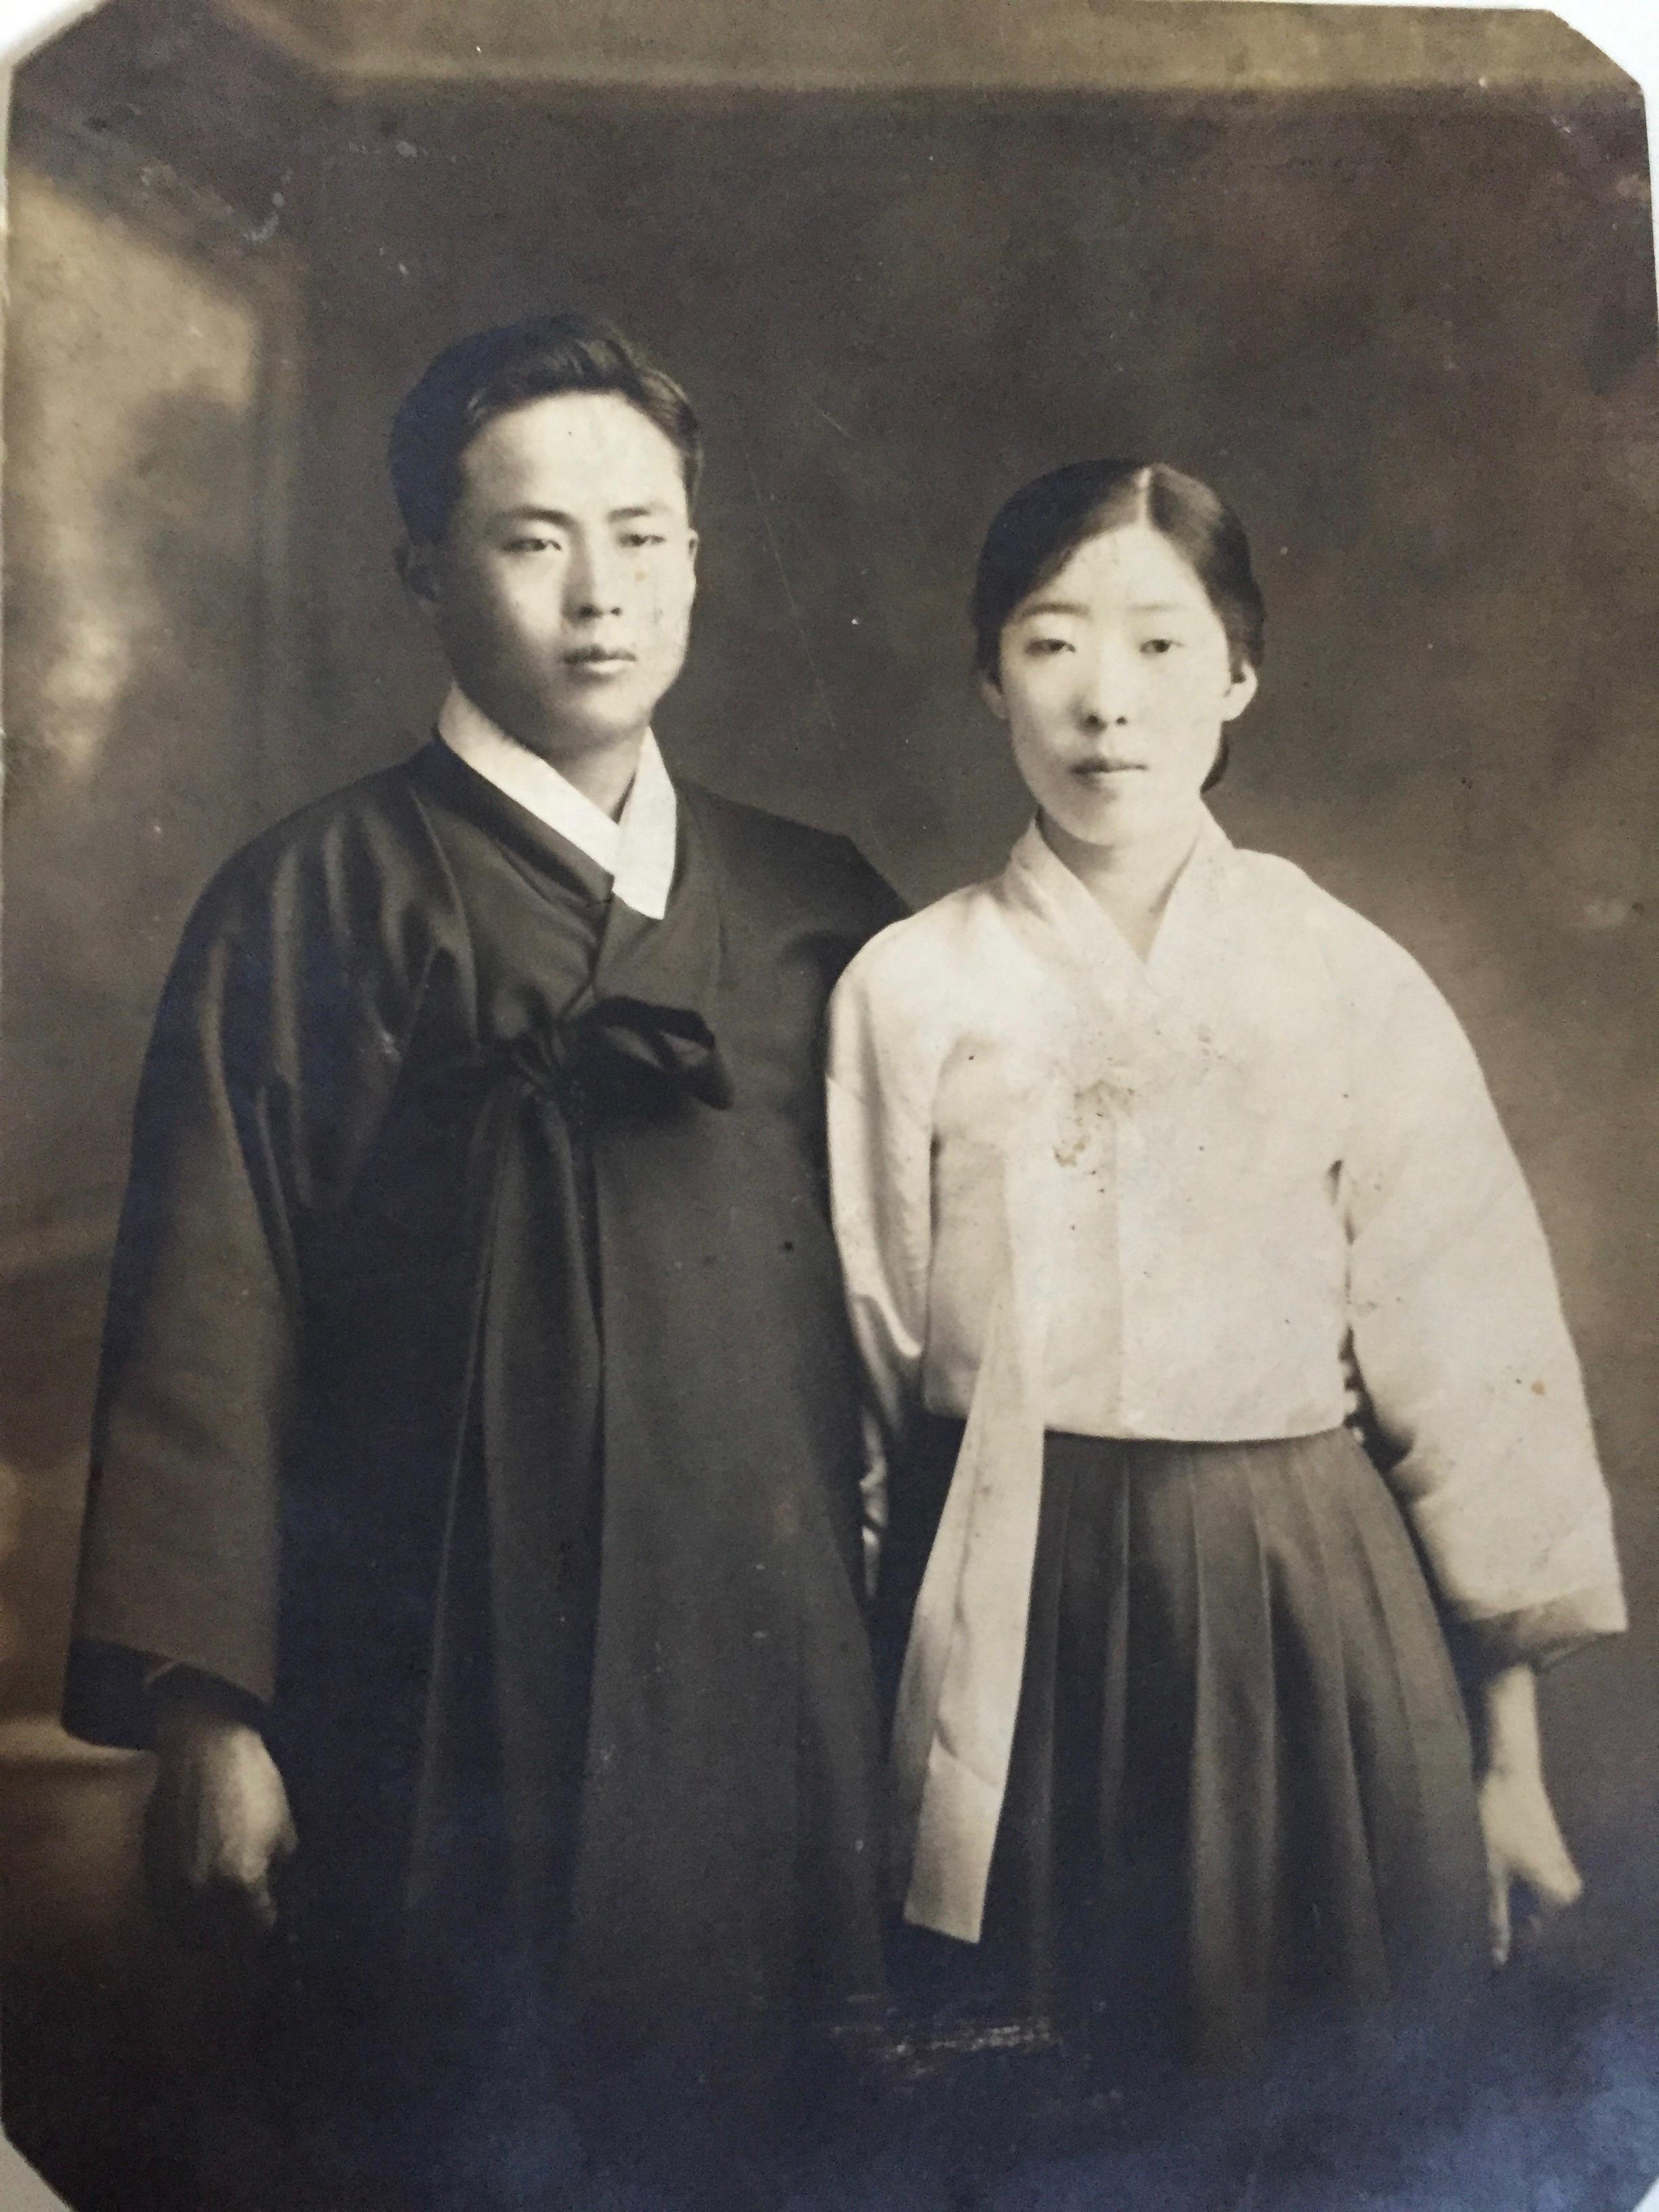 His parents' wedding photo